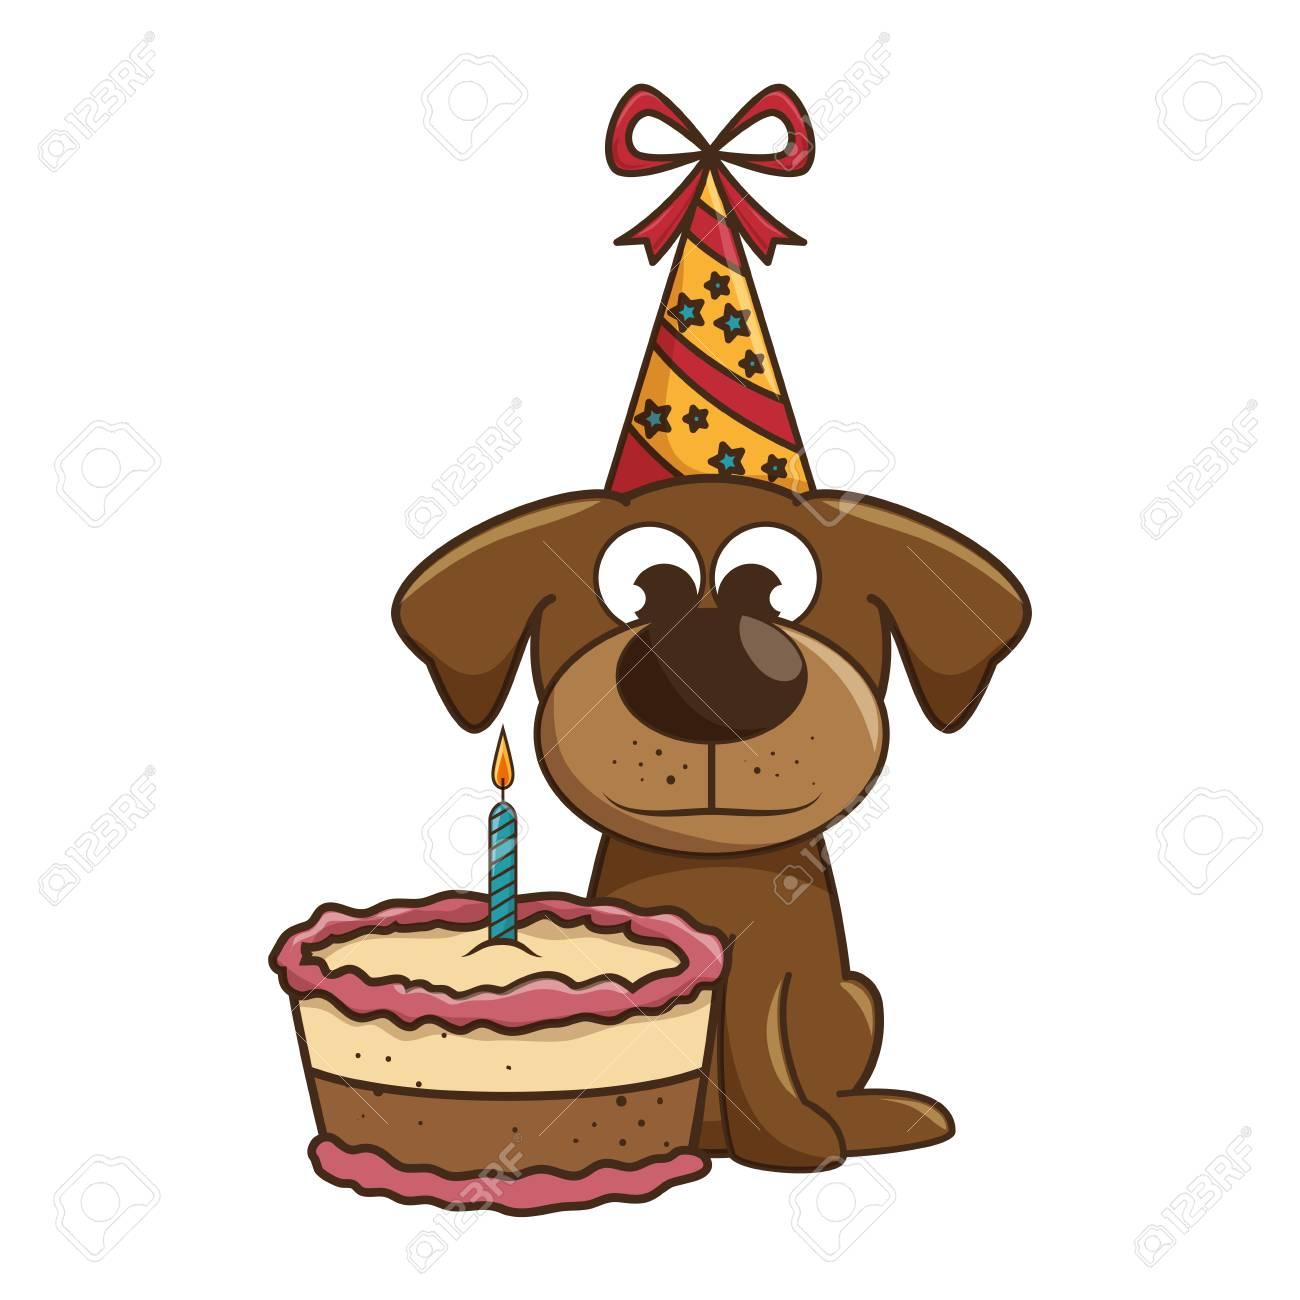 Dog Mascot With Cake Birthday Vector Illustration Design Royalty